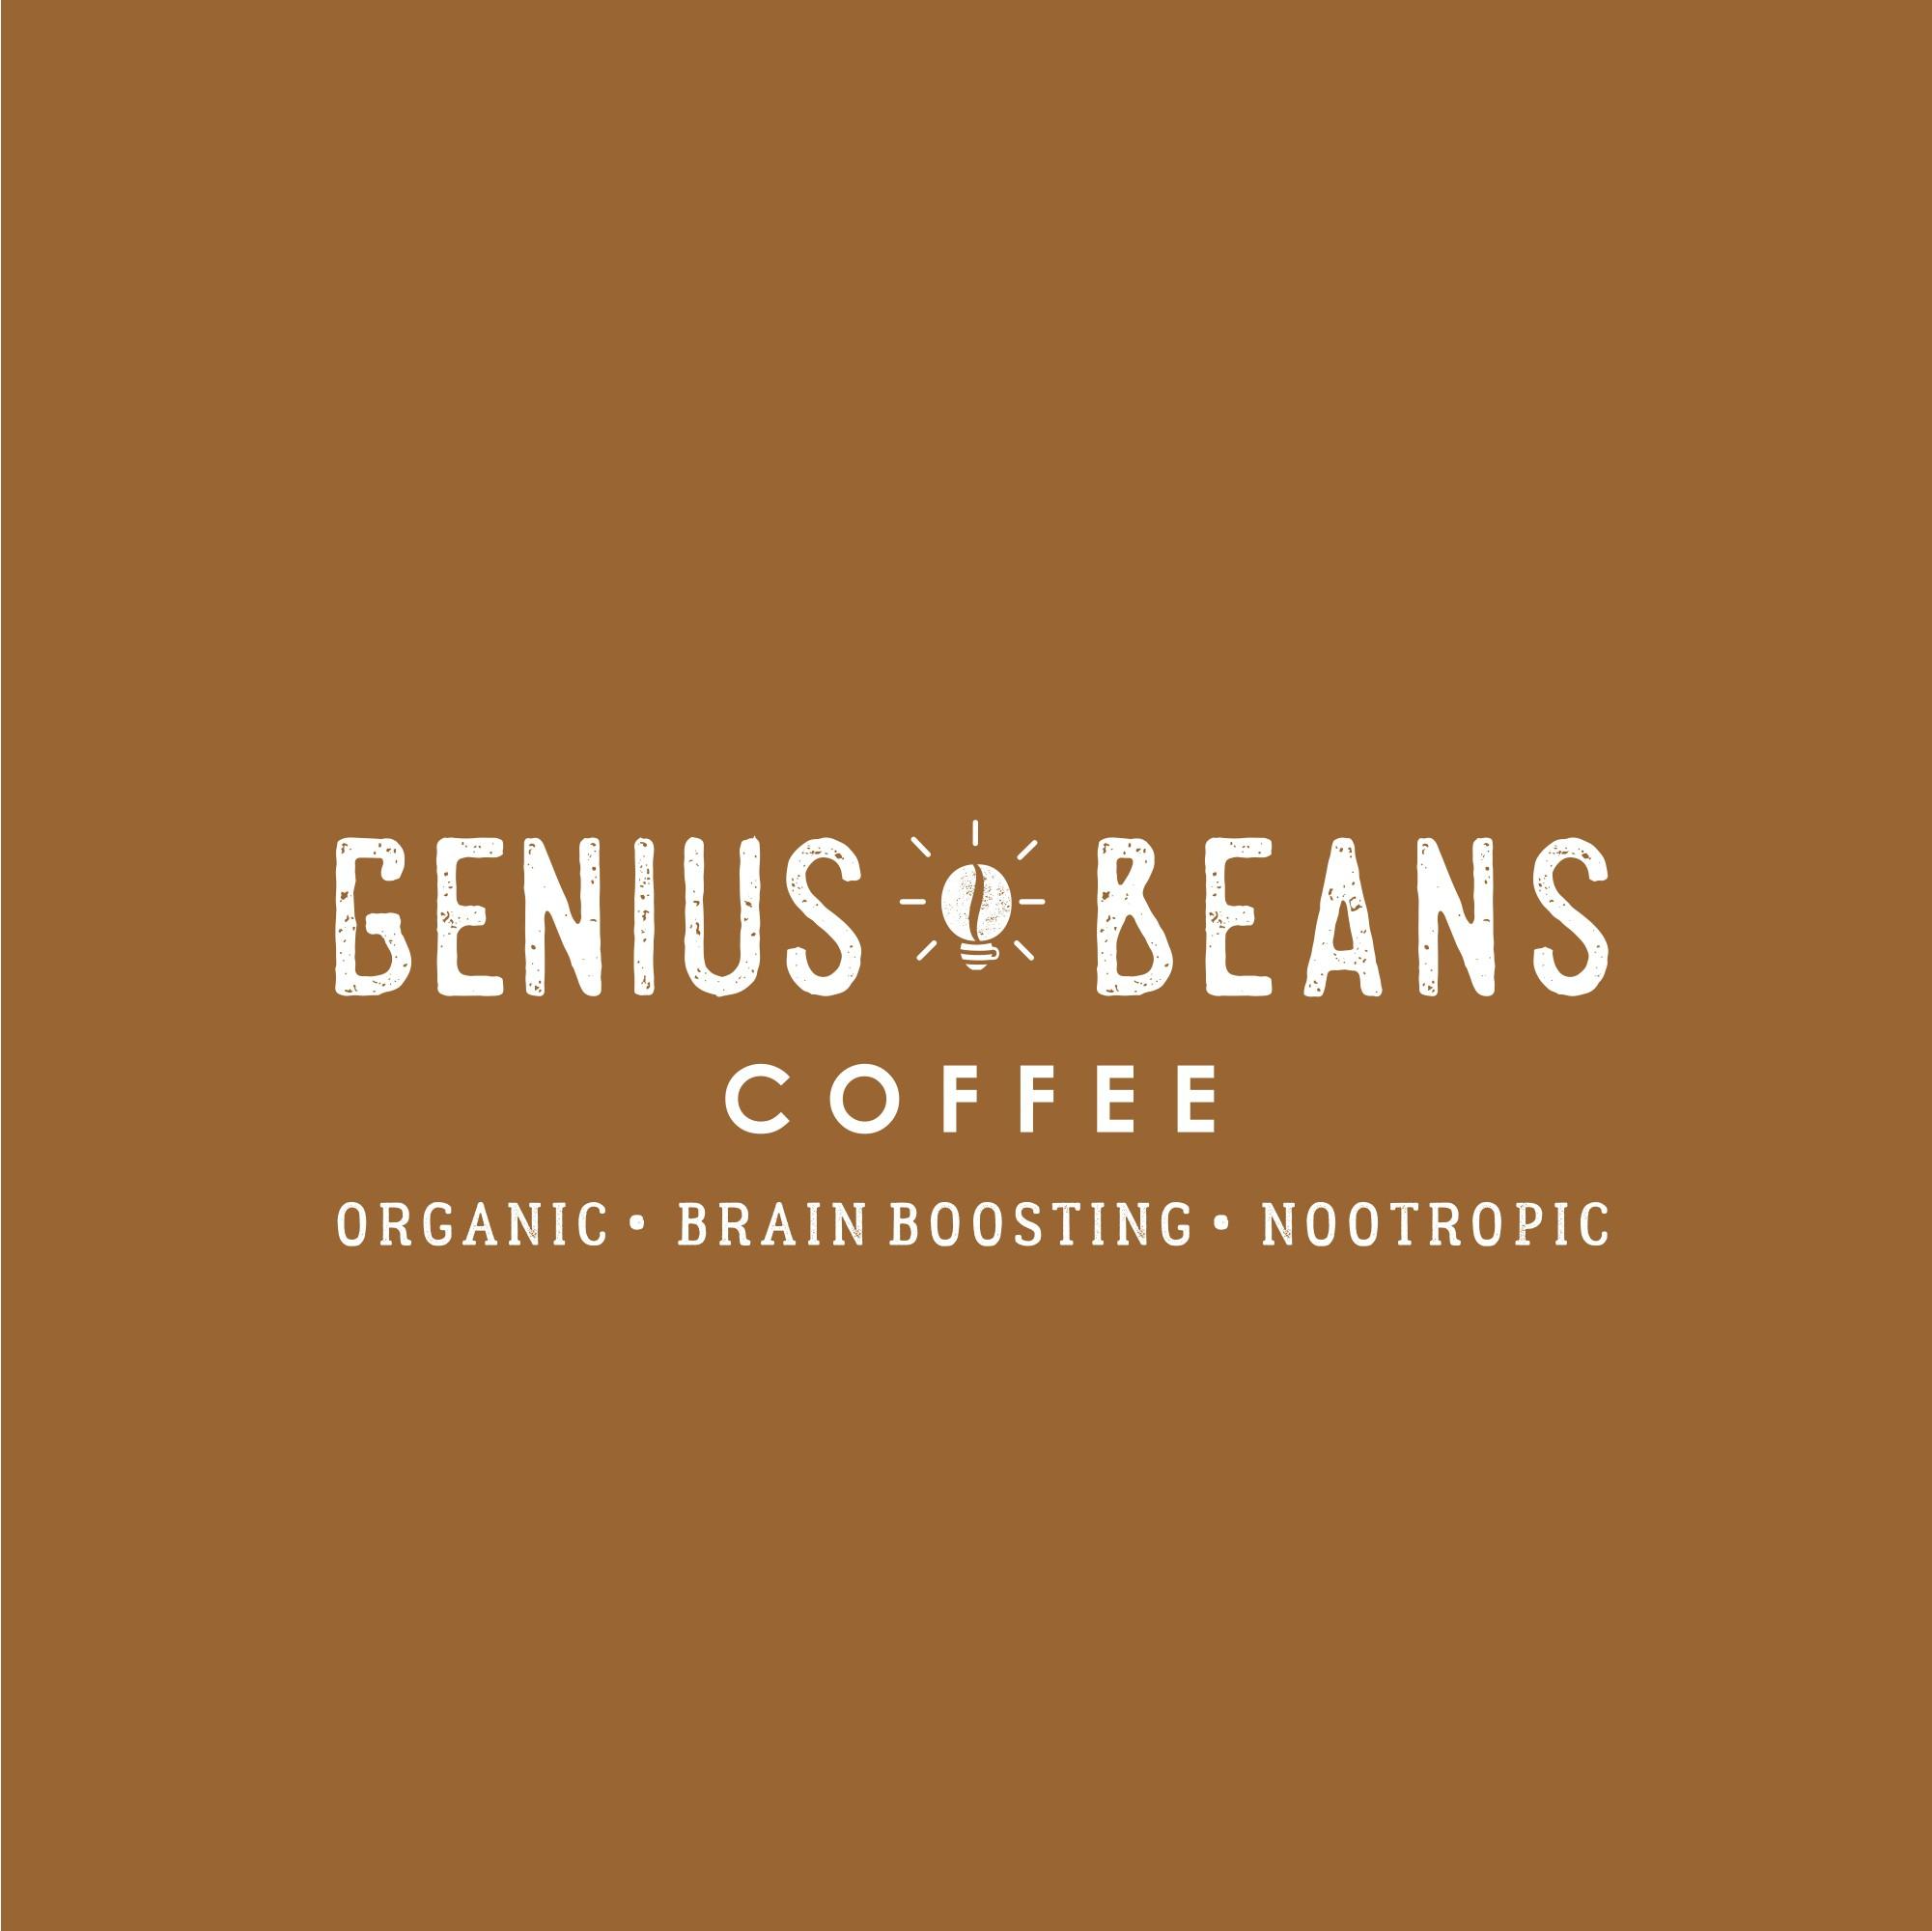 brand logo for an organic nootropic enhanced coffee company